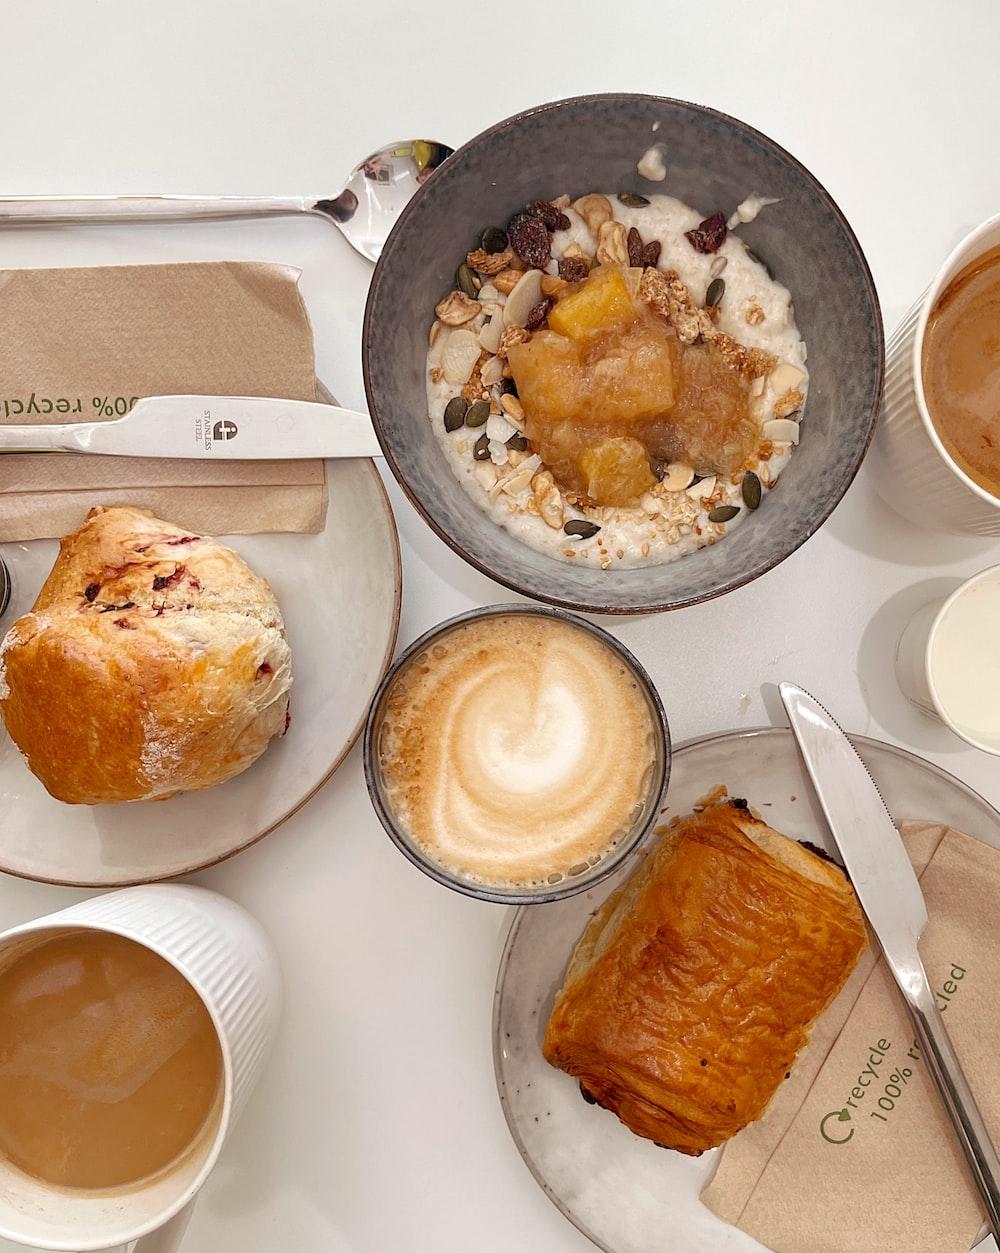 bread on white ceramic plate beside bread on white table